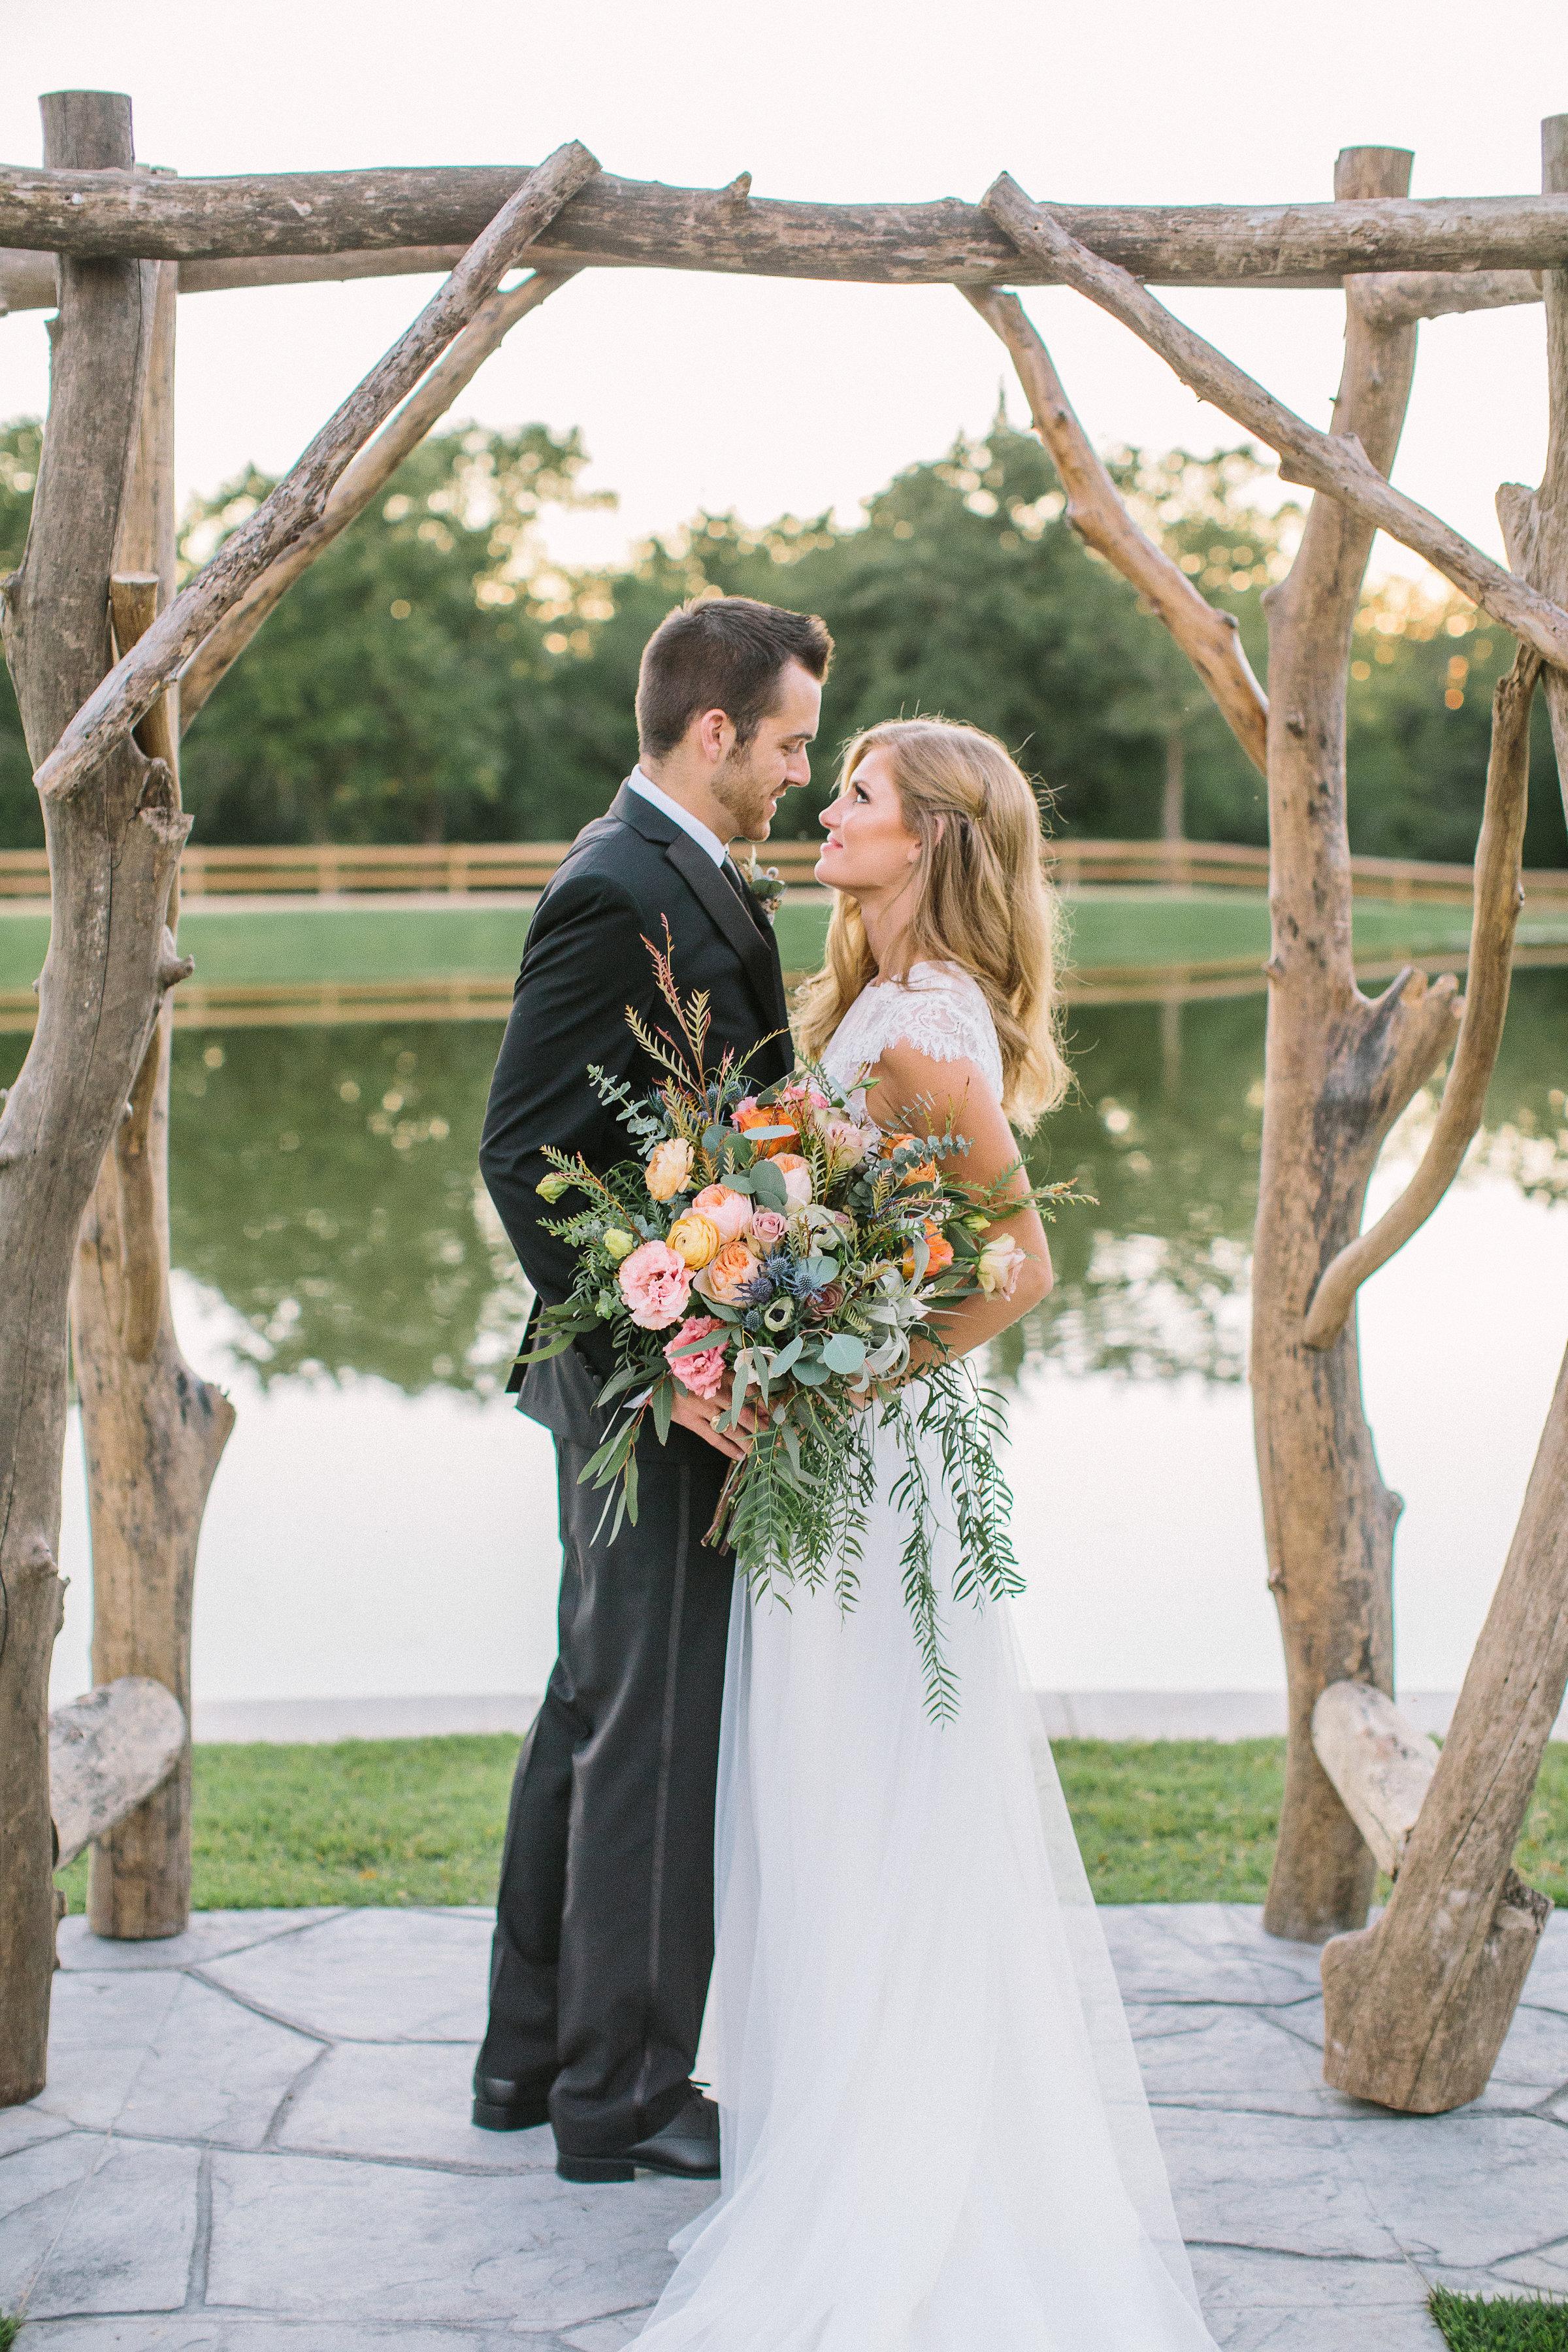 Ellen-Ashton-Photography-Peach-Creek-Ranch-Weddings-Wed-and-Prosper392